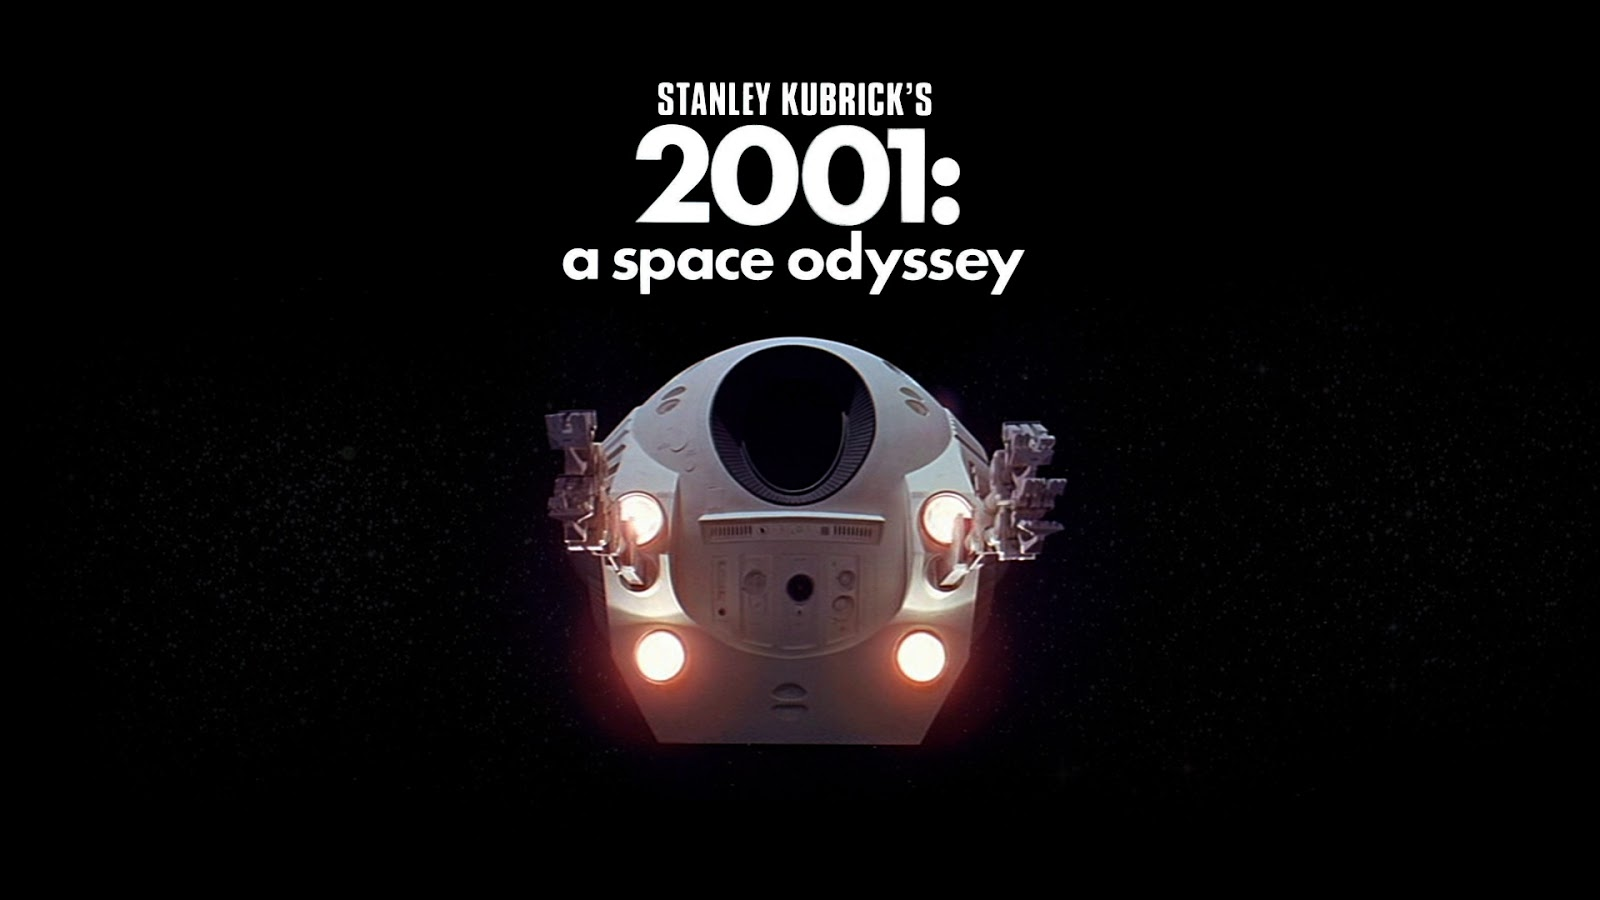 2001 a space odyssey 2001 a space odyssey - Space odyssey wallpaper ...